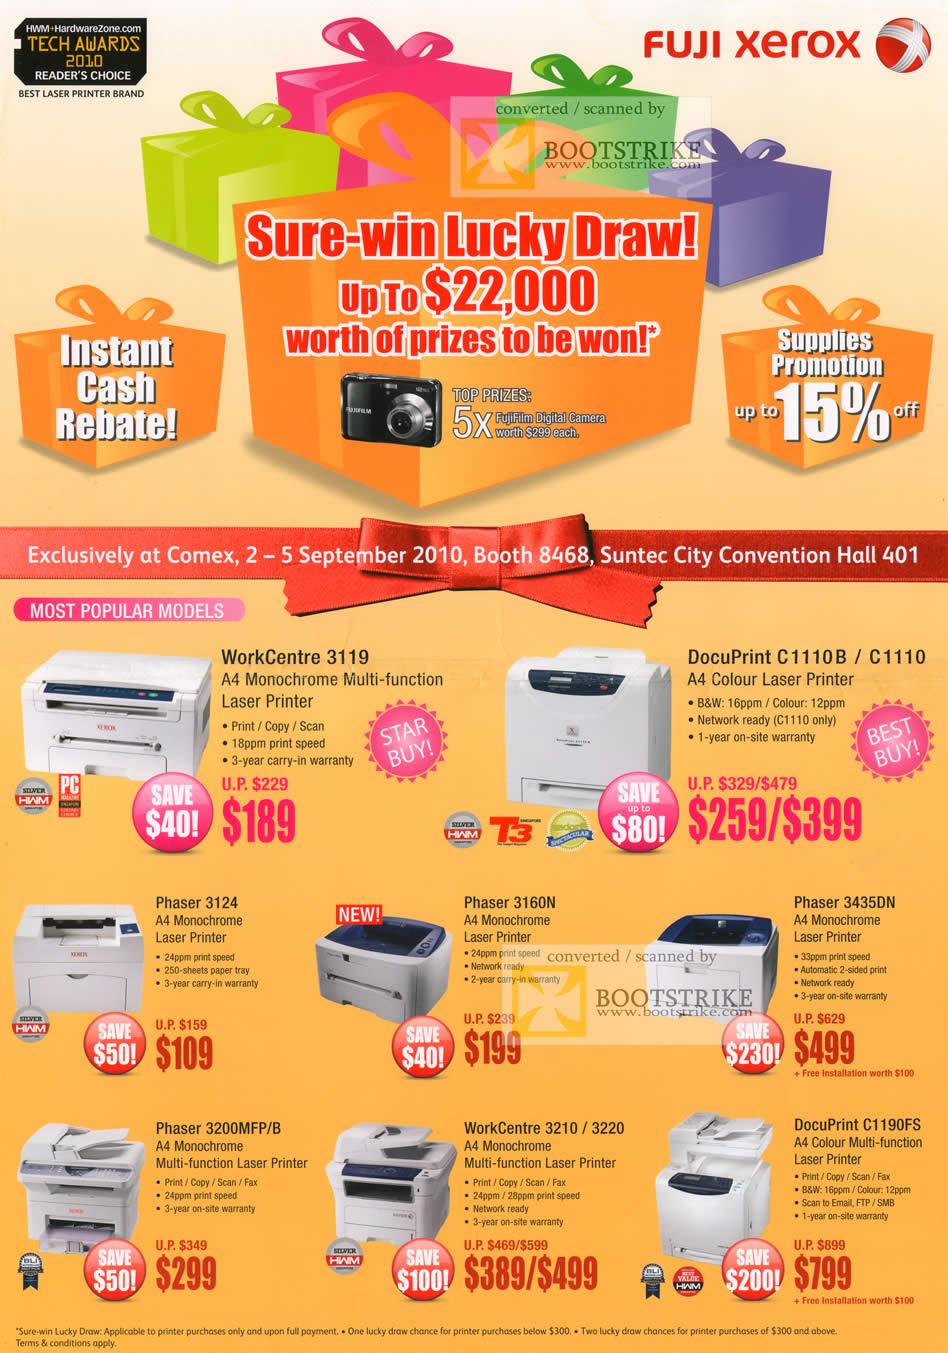 Comex 2010 price list image brochure of Fuji Xerox Printers WorkCentre 3119 3120 3220 DocuPrint C1110B C1110 C1190FS Phaser 3124 3160N 3435DN 3200MFP